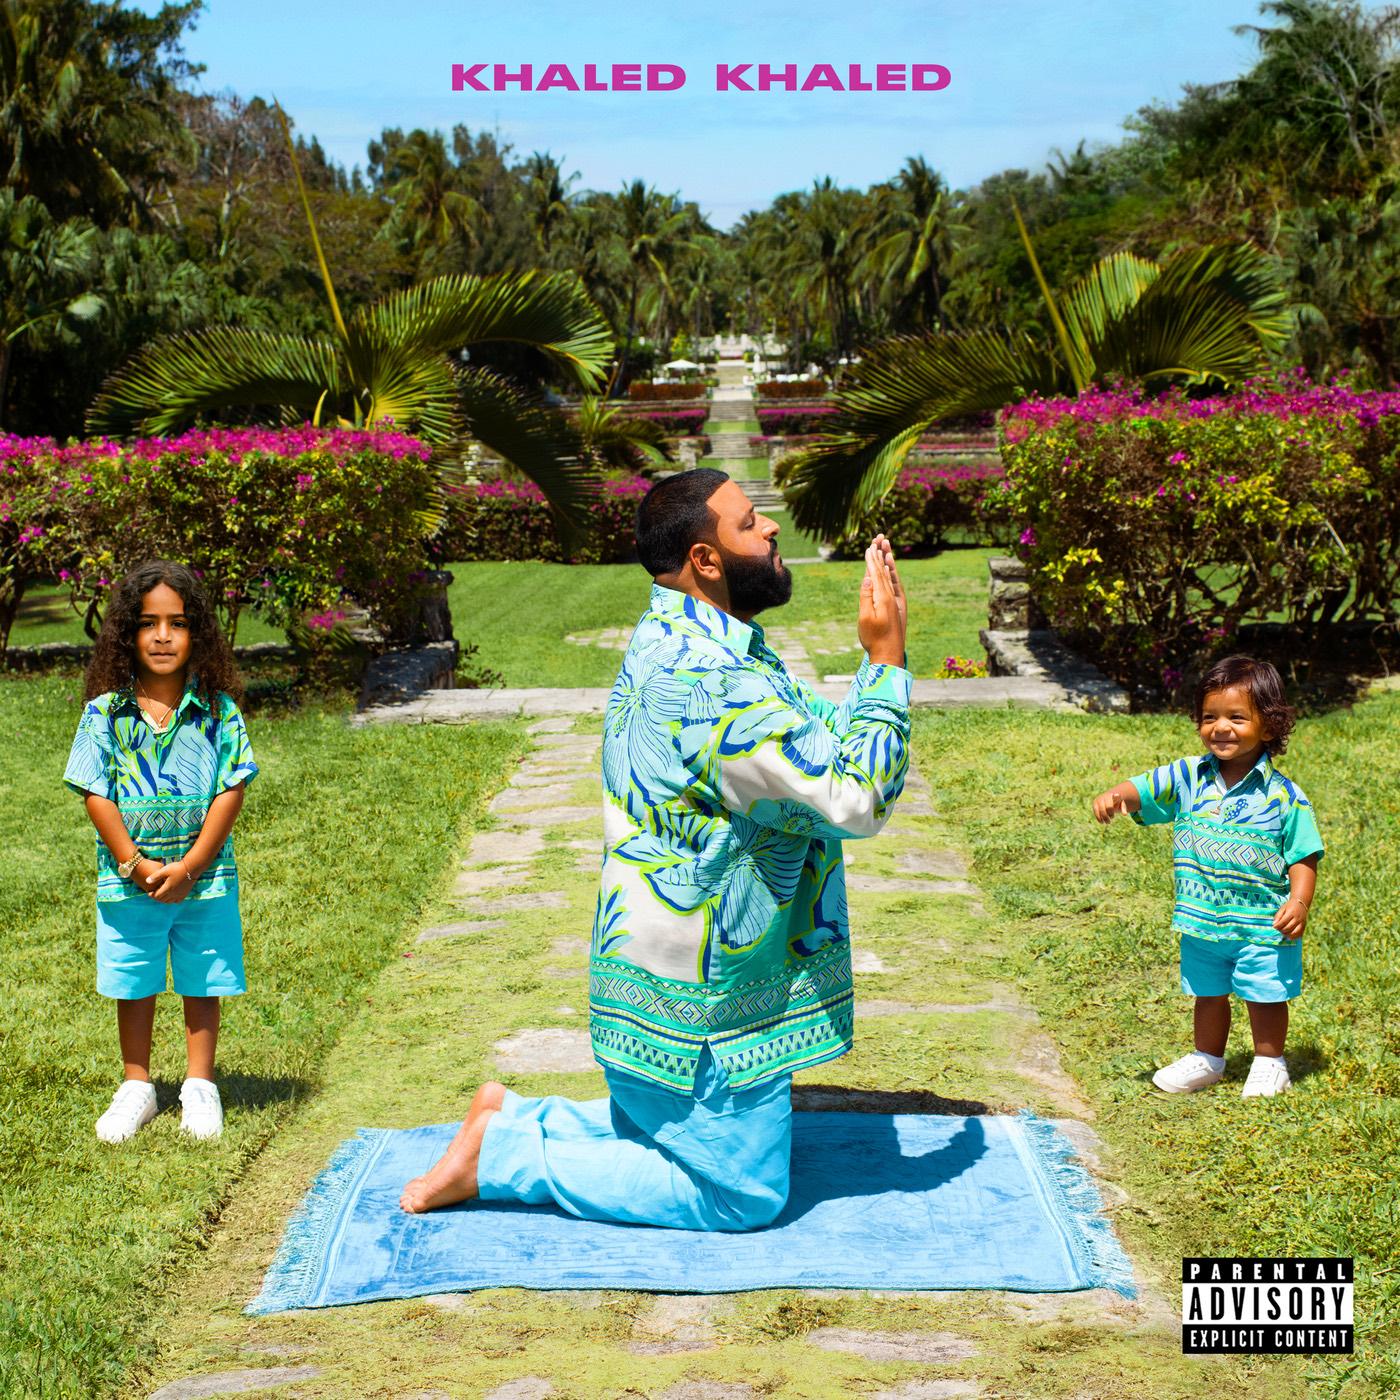 Art for We Going Crazy by DJ Khaled ft H.E.R. & Migos